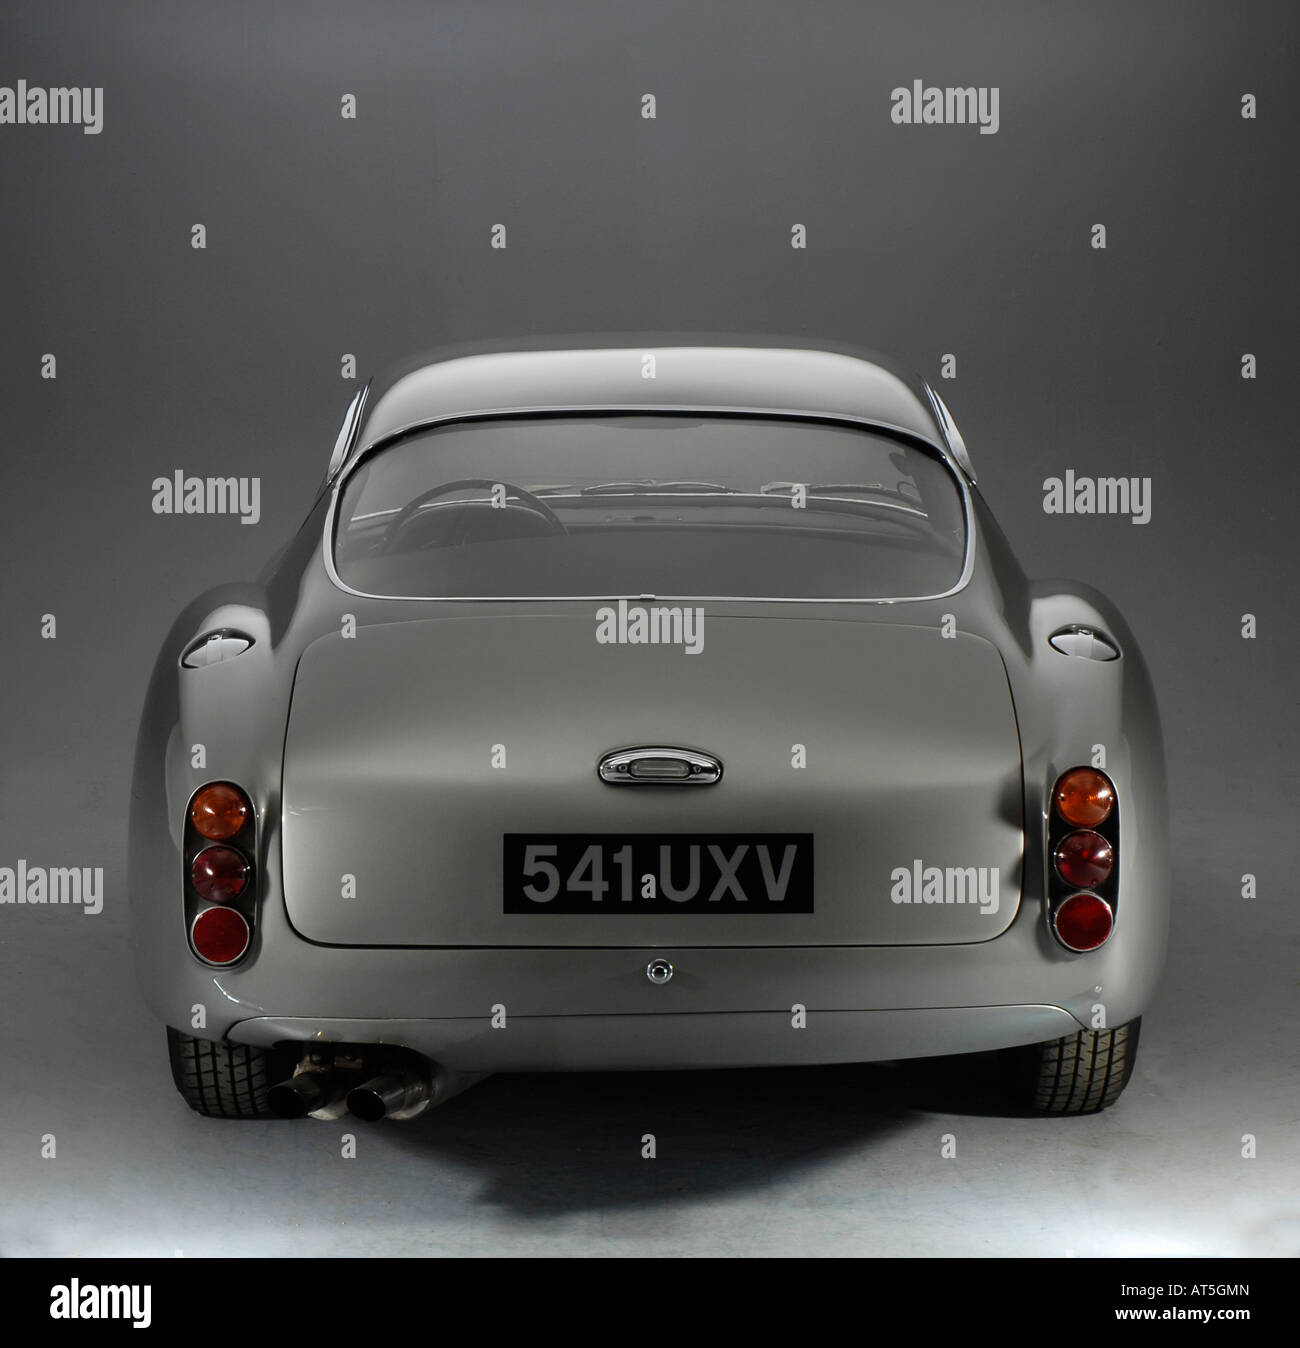 1961 Aston Martin DB4 GT Zagato Rear View Stock Photo